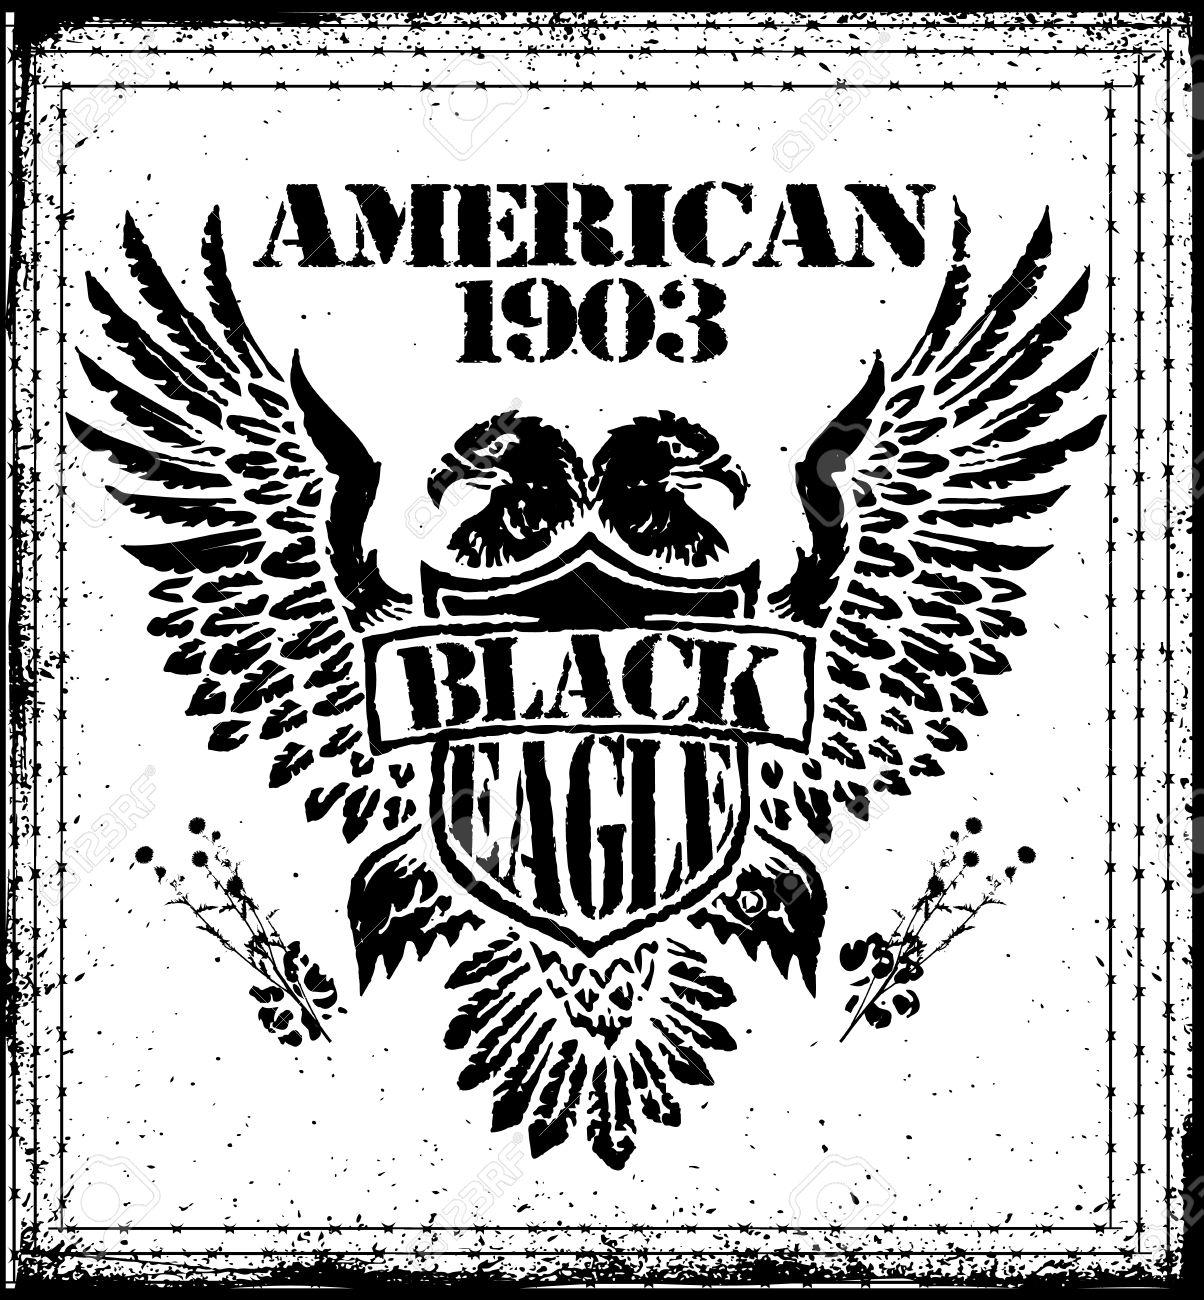 Design t shirt artwork - American Eagle Man T Shirt Graphic Design Stock Vector 34150127